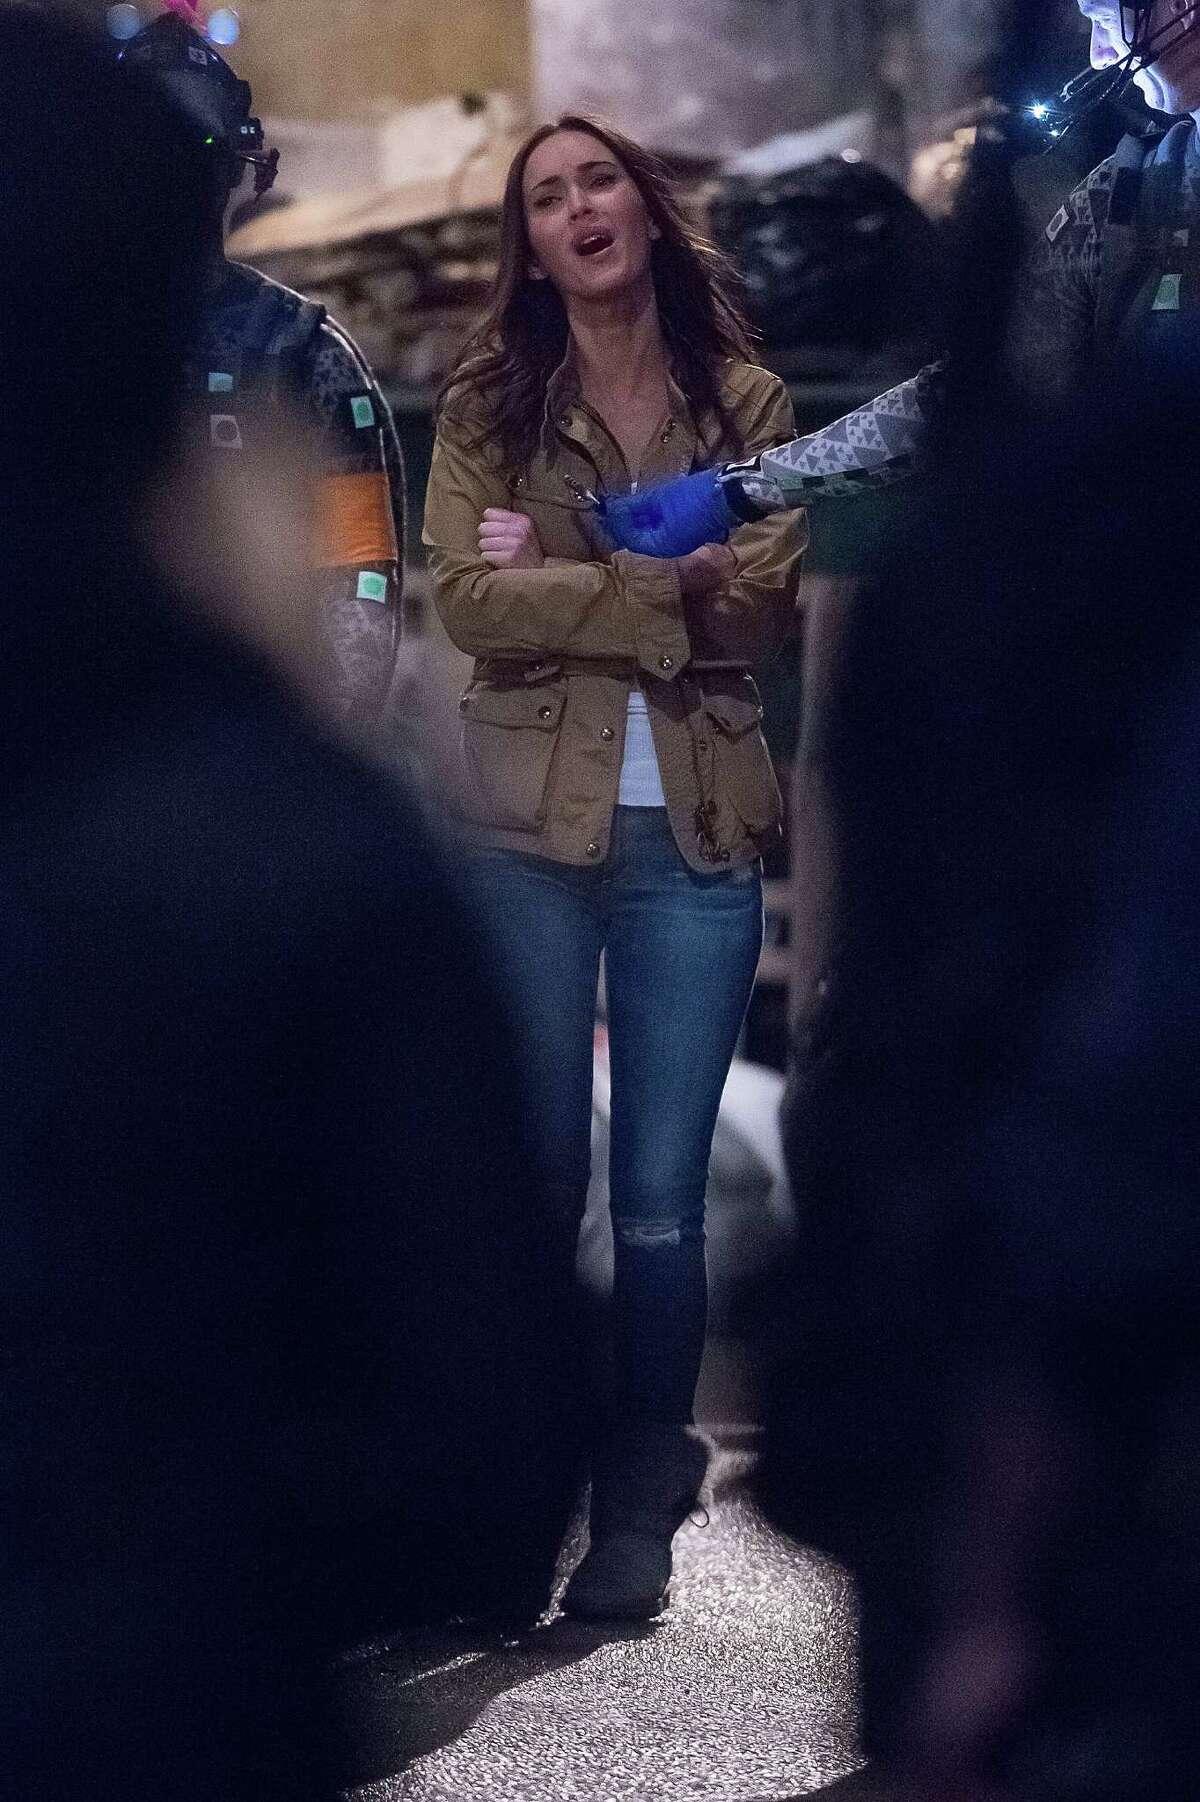 Actress Megan Fox seen on the set of 'Teenage Mutant Ninja Turtles 2' filming in Manhattan on May 1, 2015 in New York City.